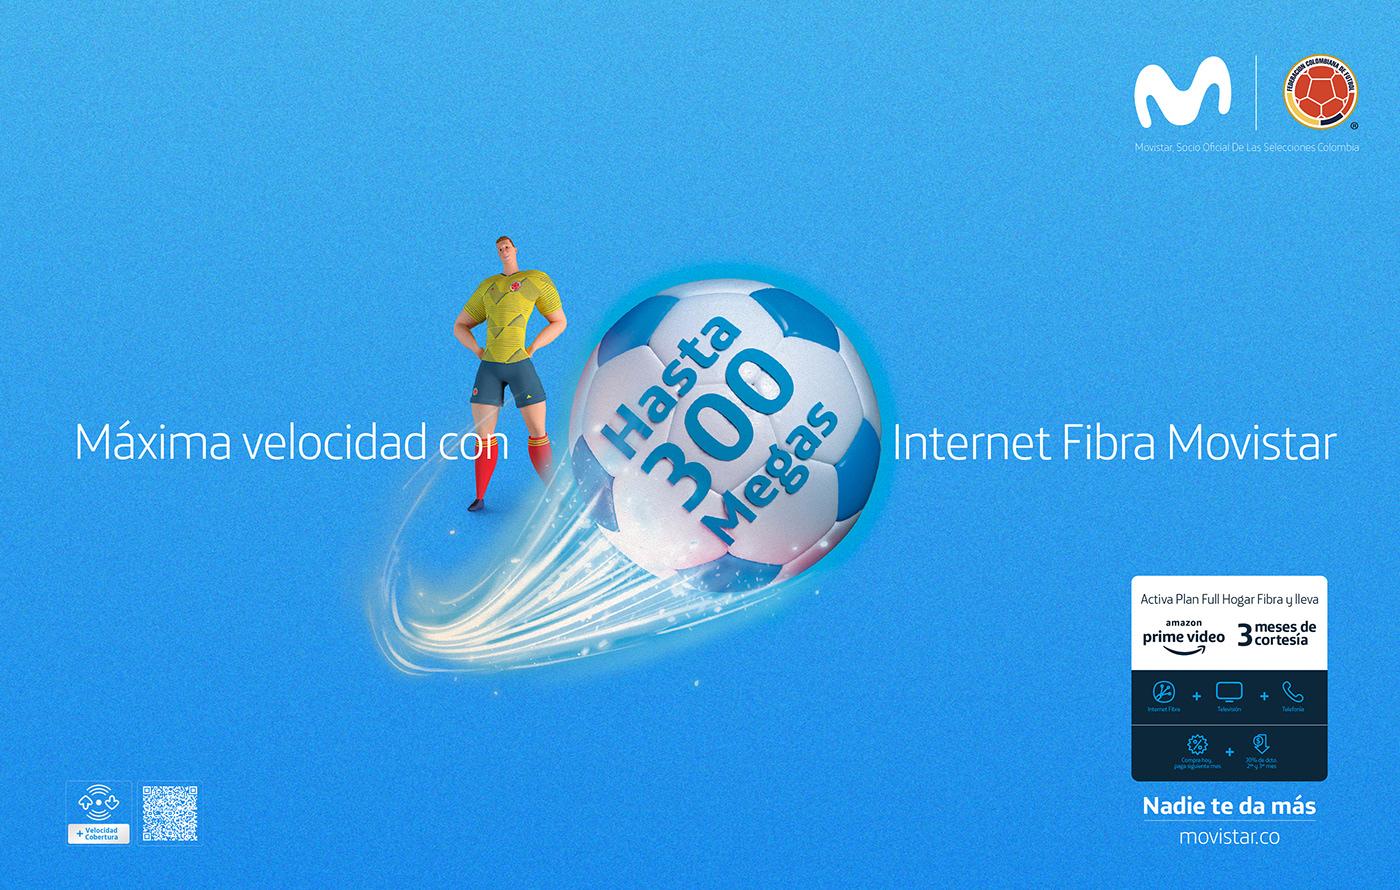 3D 3dcharacter colombia cuadrado falcao Futbol james movistar seleccioncolombia soccer